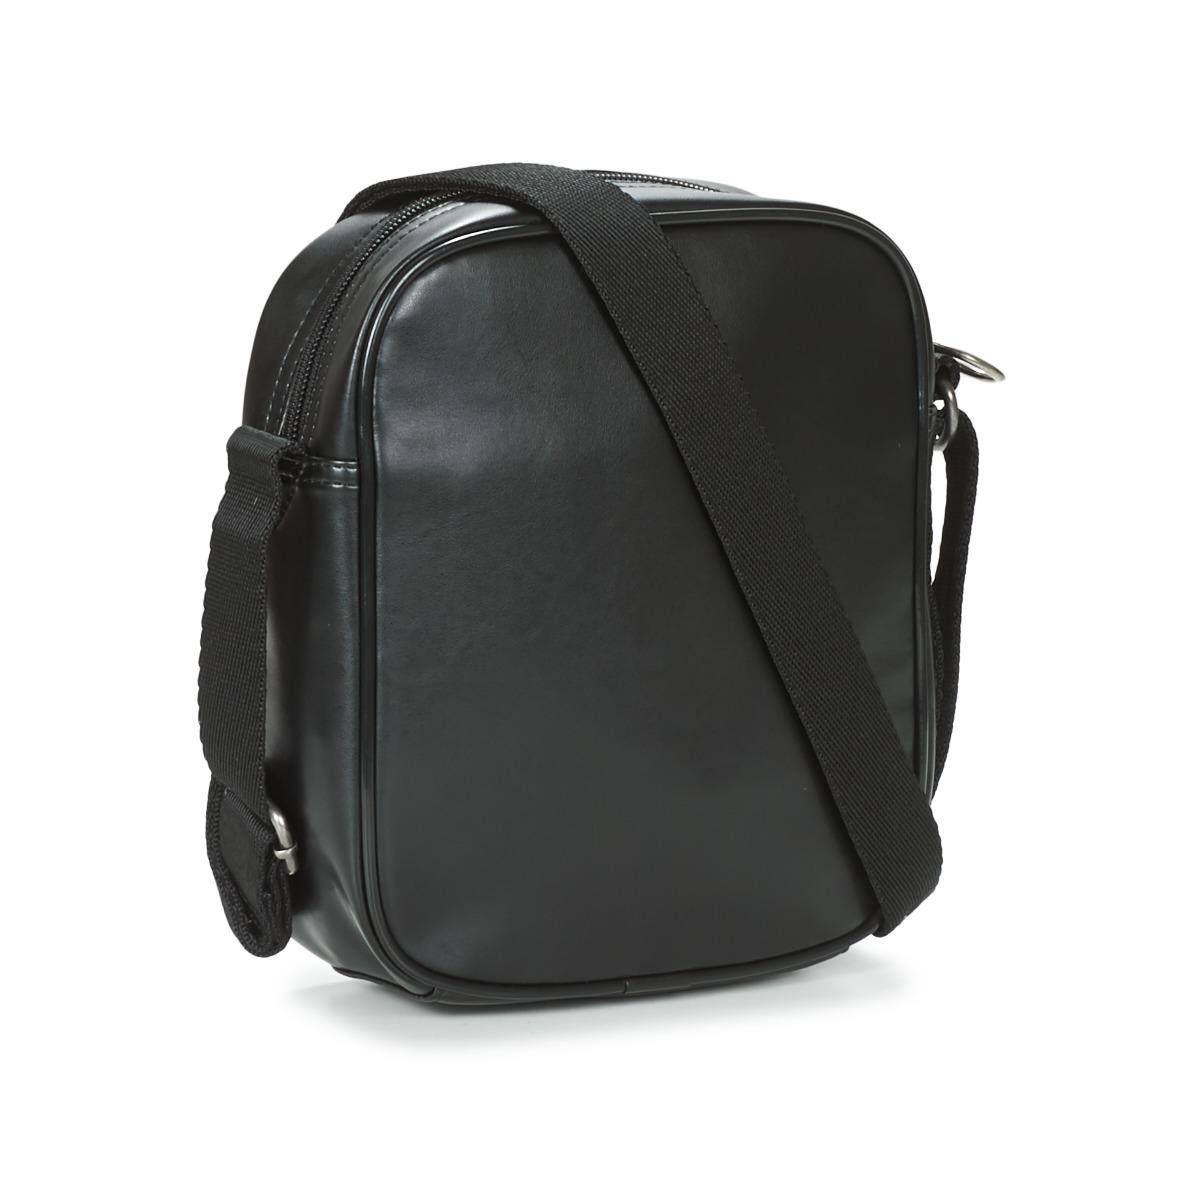 PUMA Originals Portable Men s Pouch In Black in Black for Men - Lyst 2d3f41c9535bd